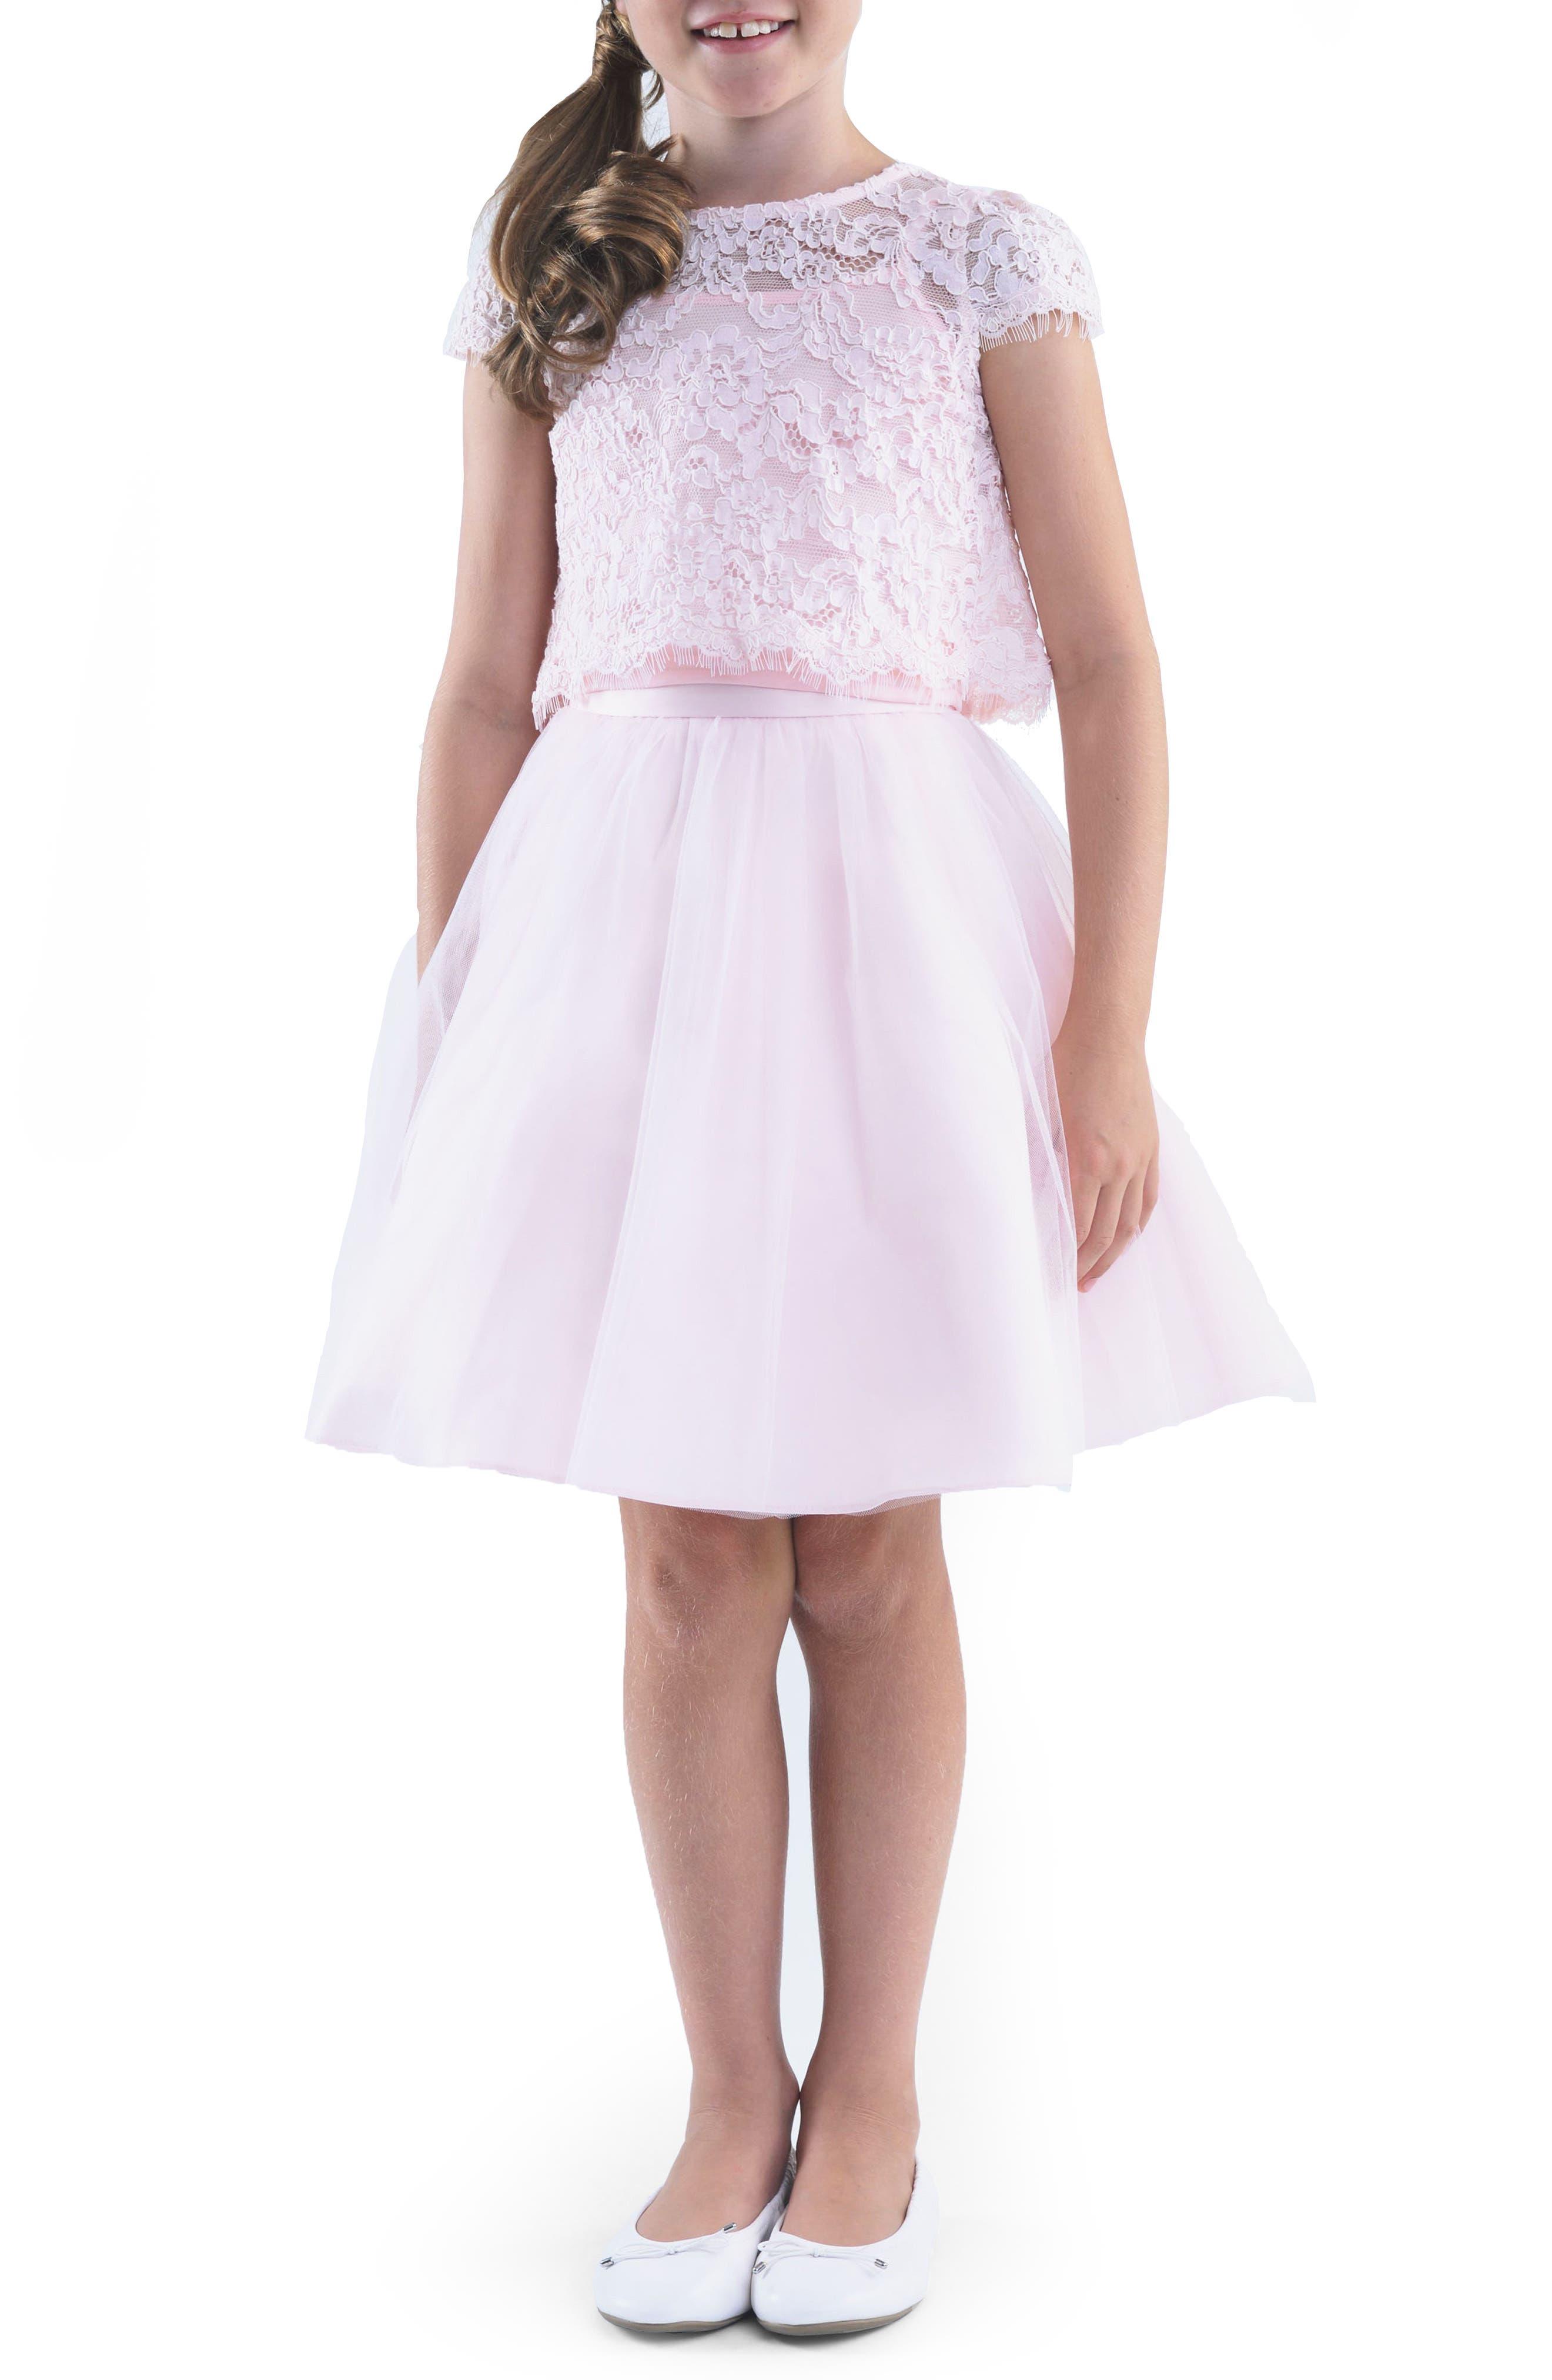 Main Image - Us Angels Lace Top & Mesh Skirt Set (Toddler Girls, Little Girls & Big Girls)